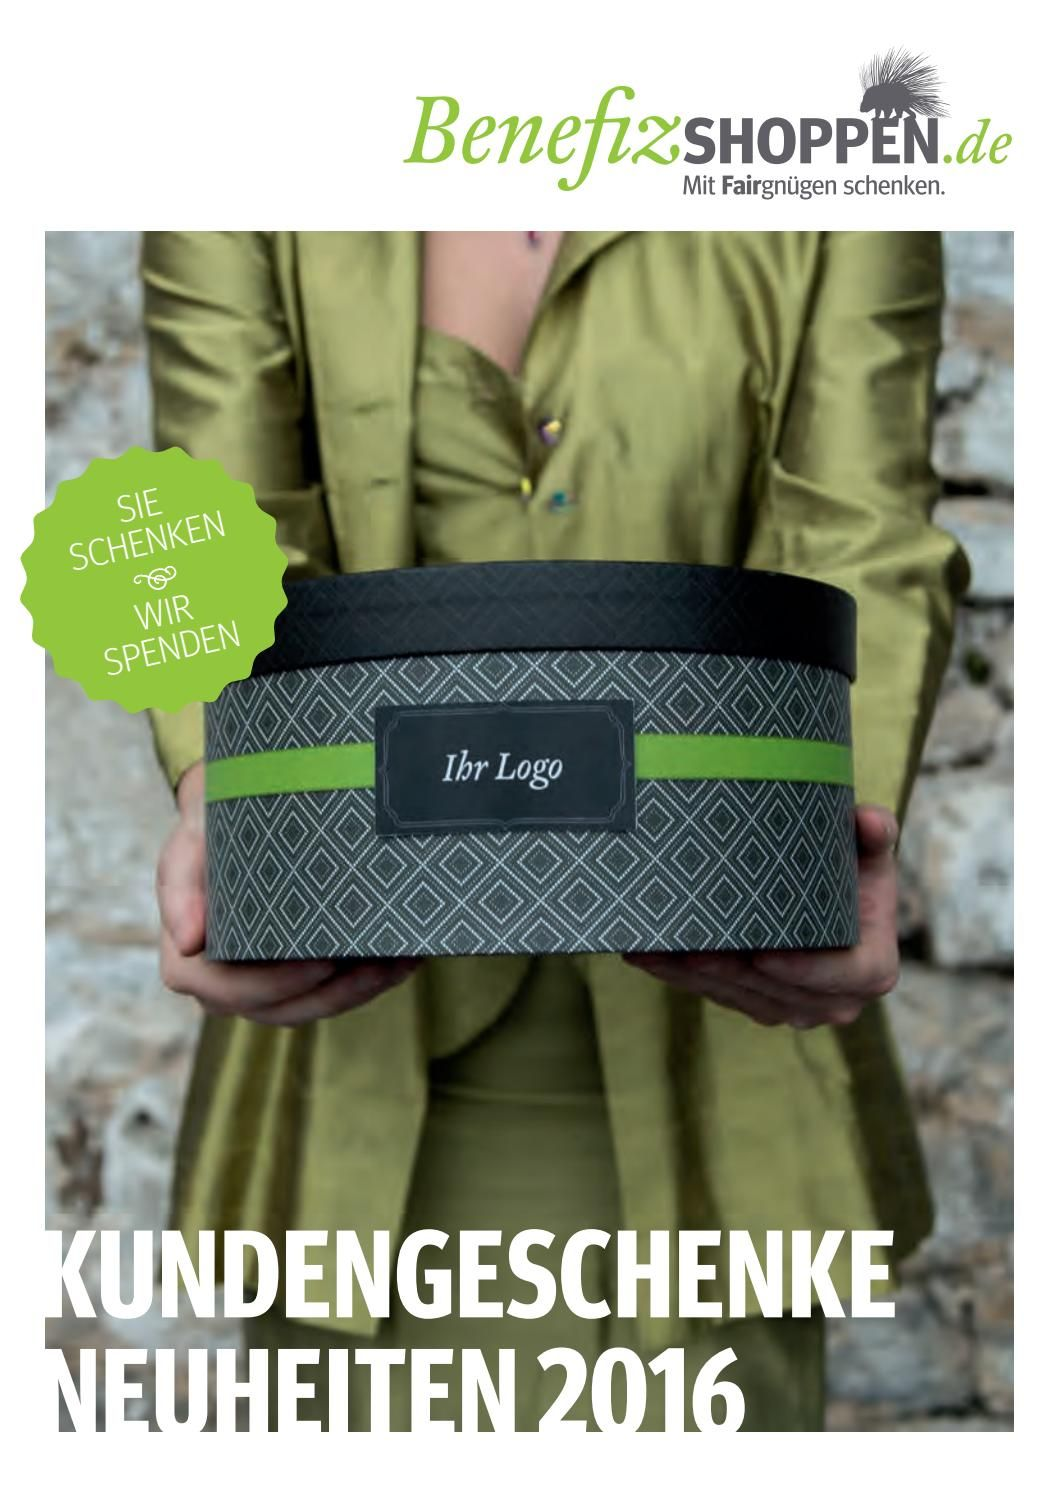 Benefizshoppen Katalog Kundengeschenke 2016 | Kundengeschenke ...